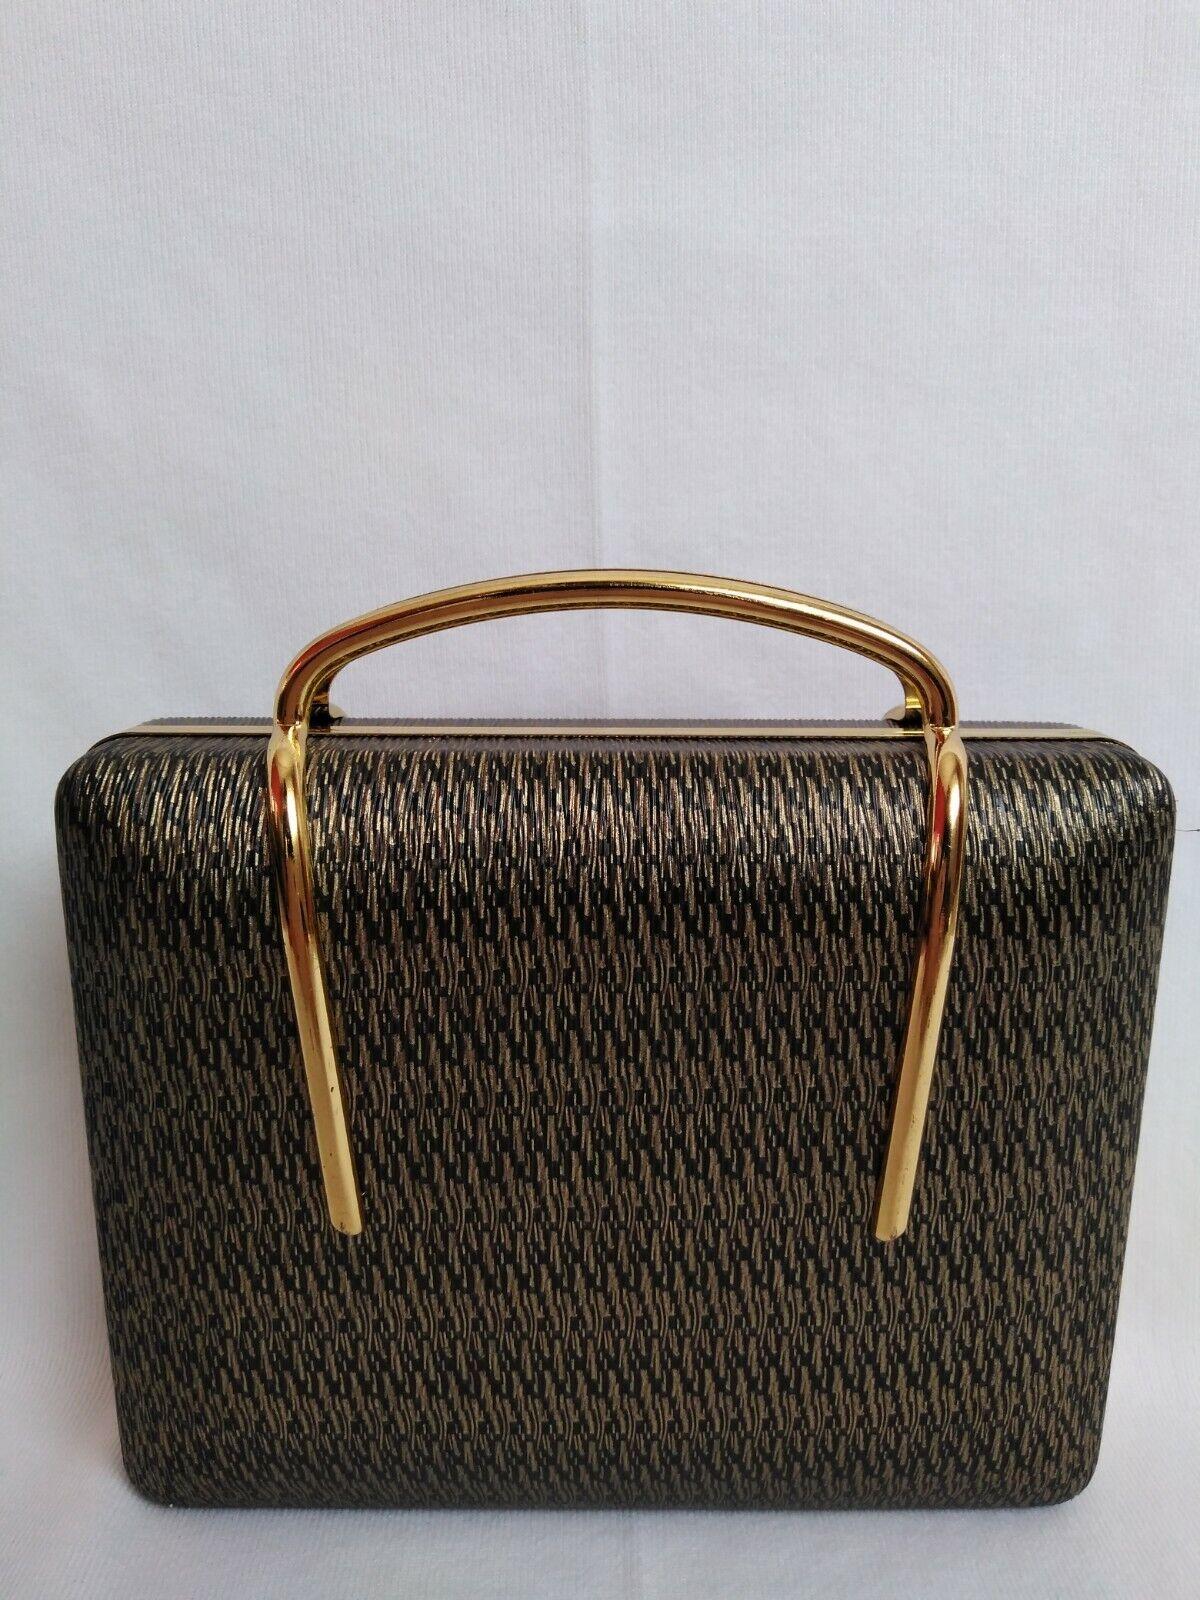 Clutch, bolso o cartera dorado años 50